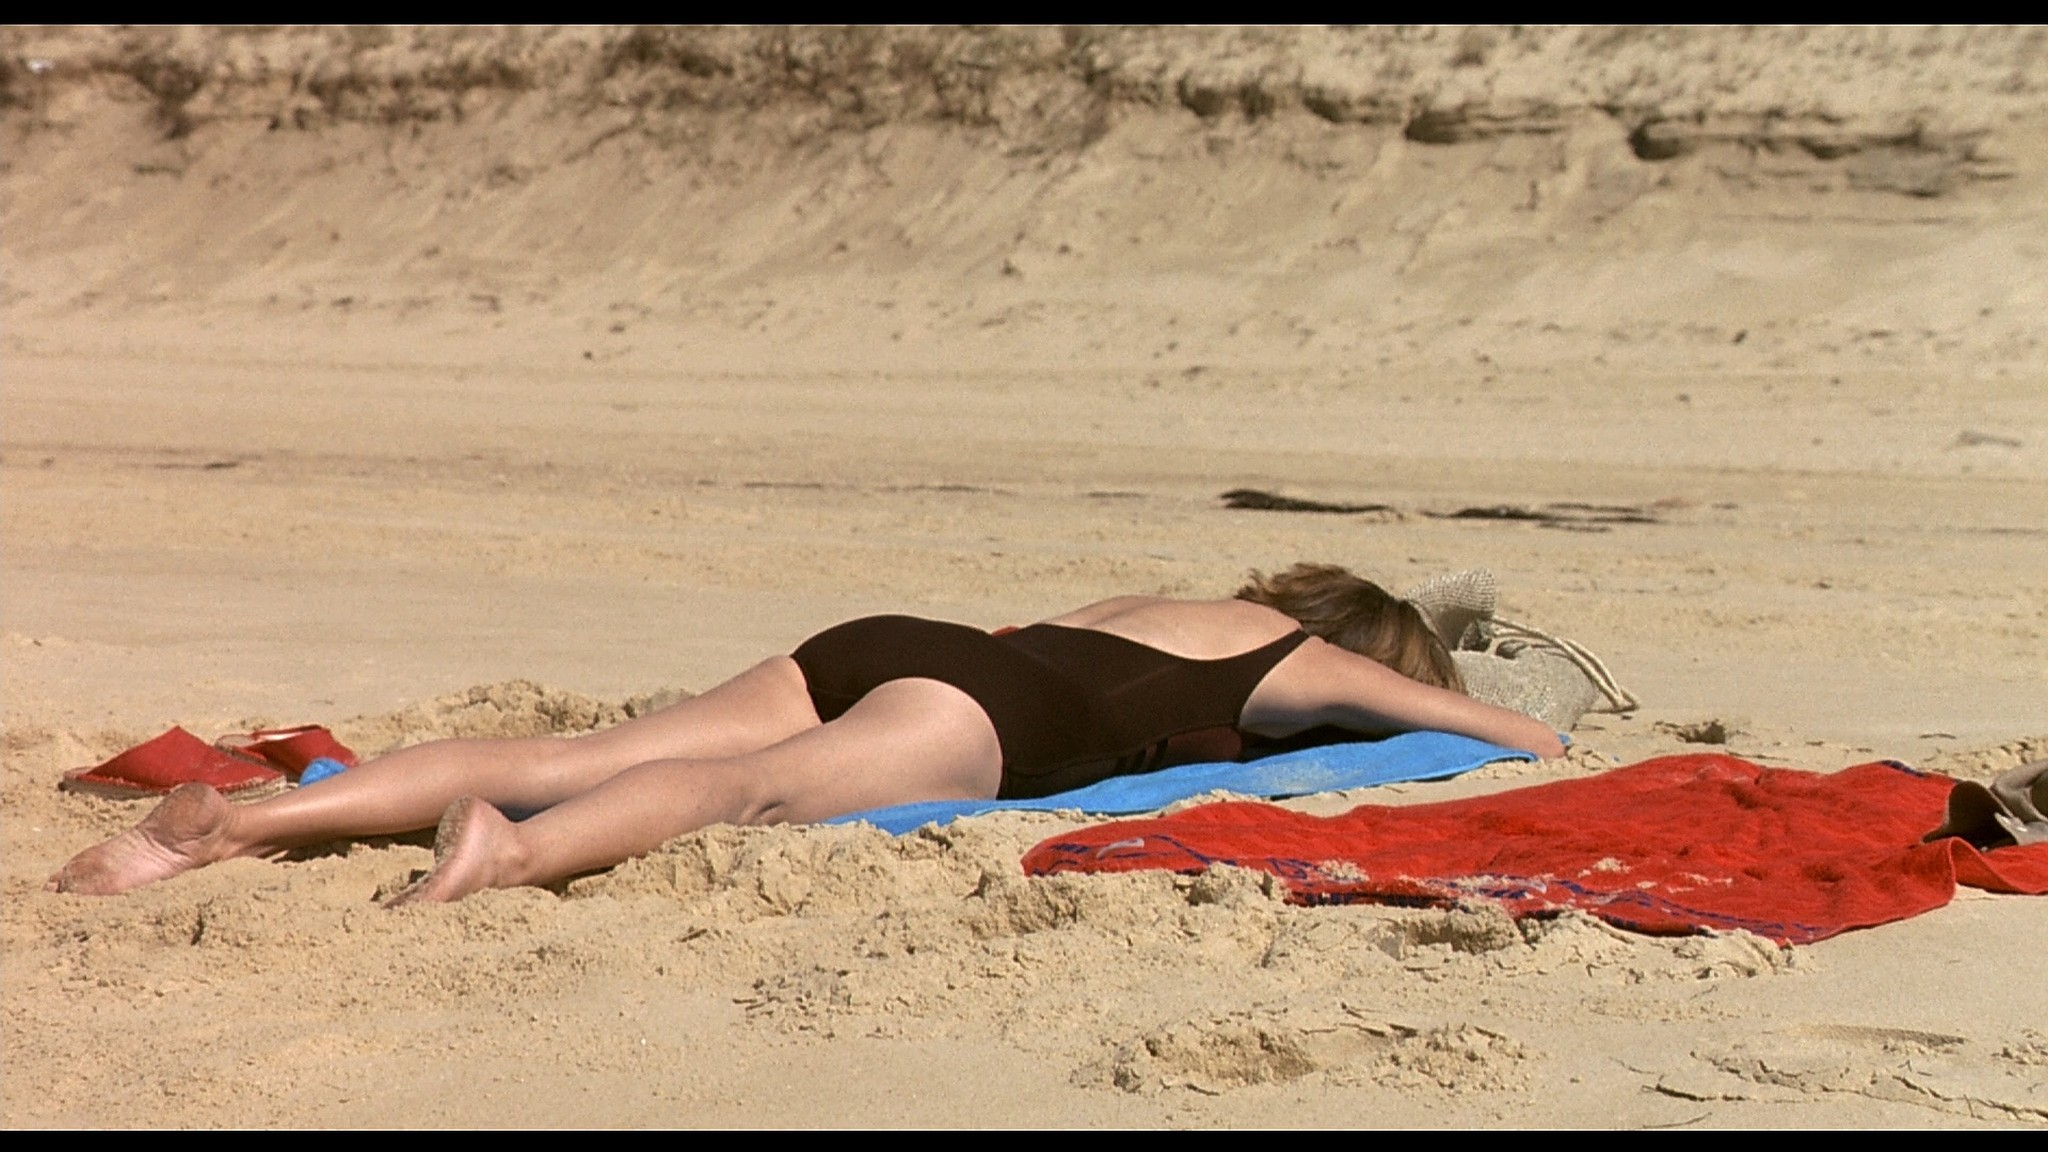 Charlotte Rampling nude sex Maya Gaugler nude full frontal Under the Sand FR 2000 1080p BluRay REMUX